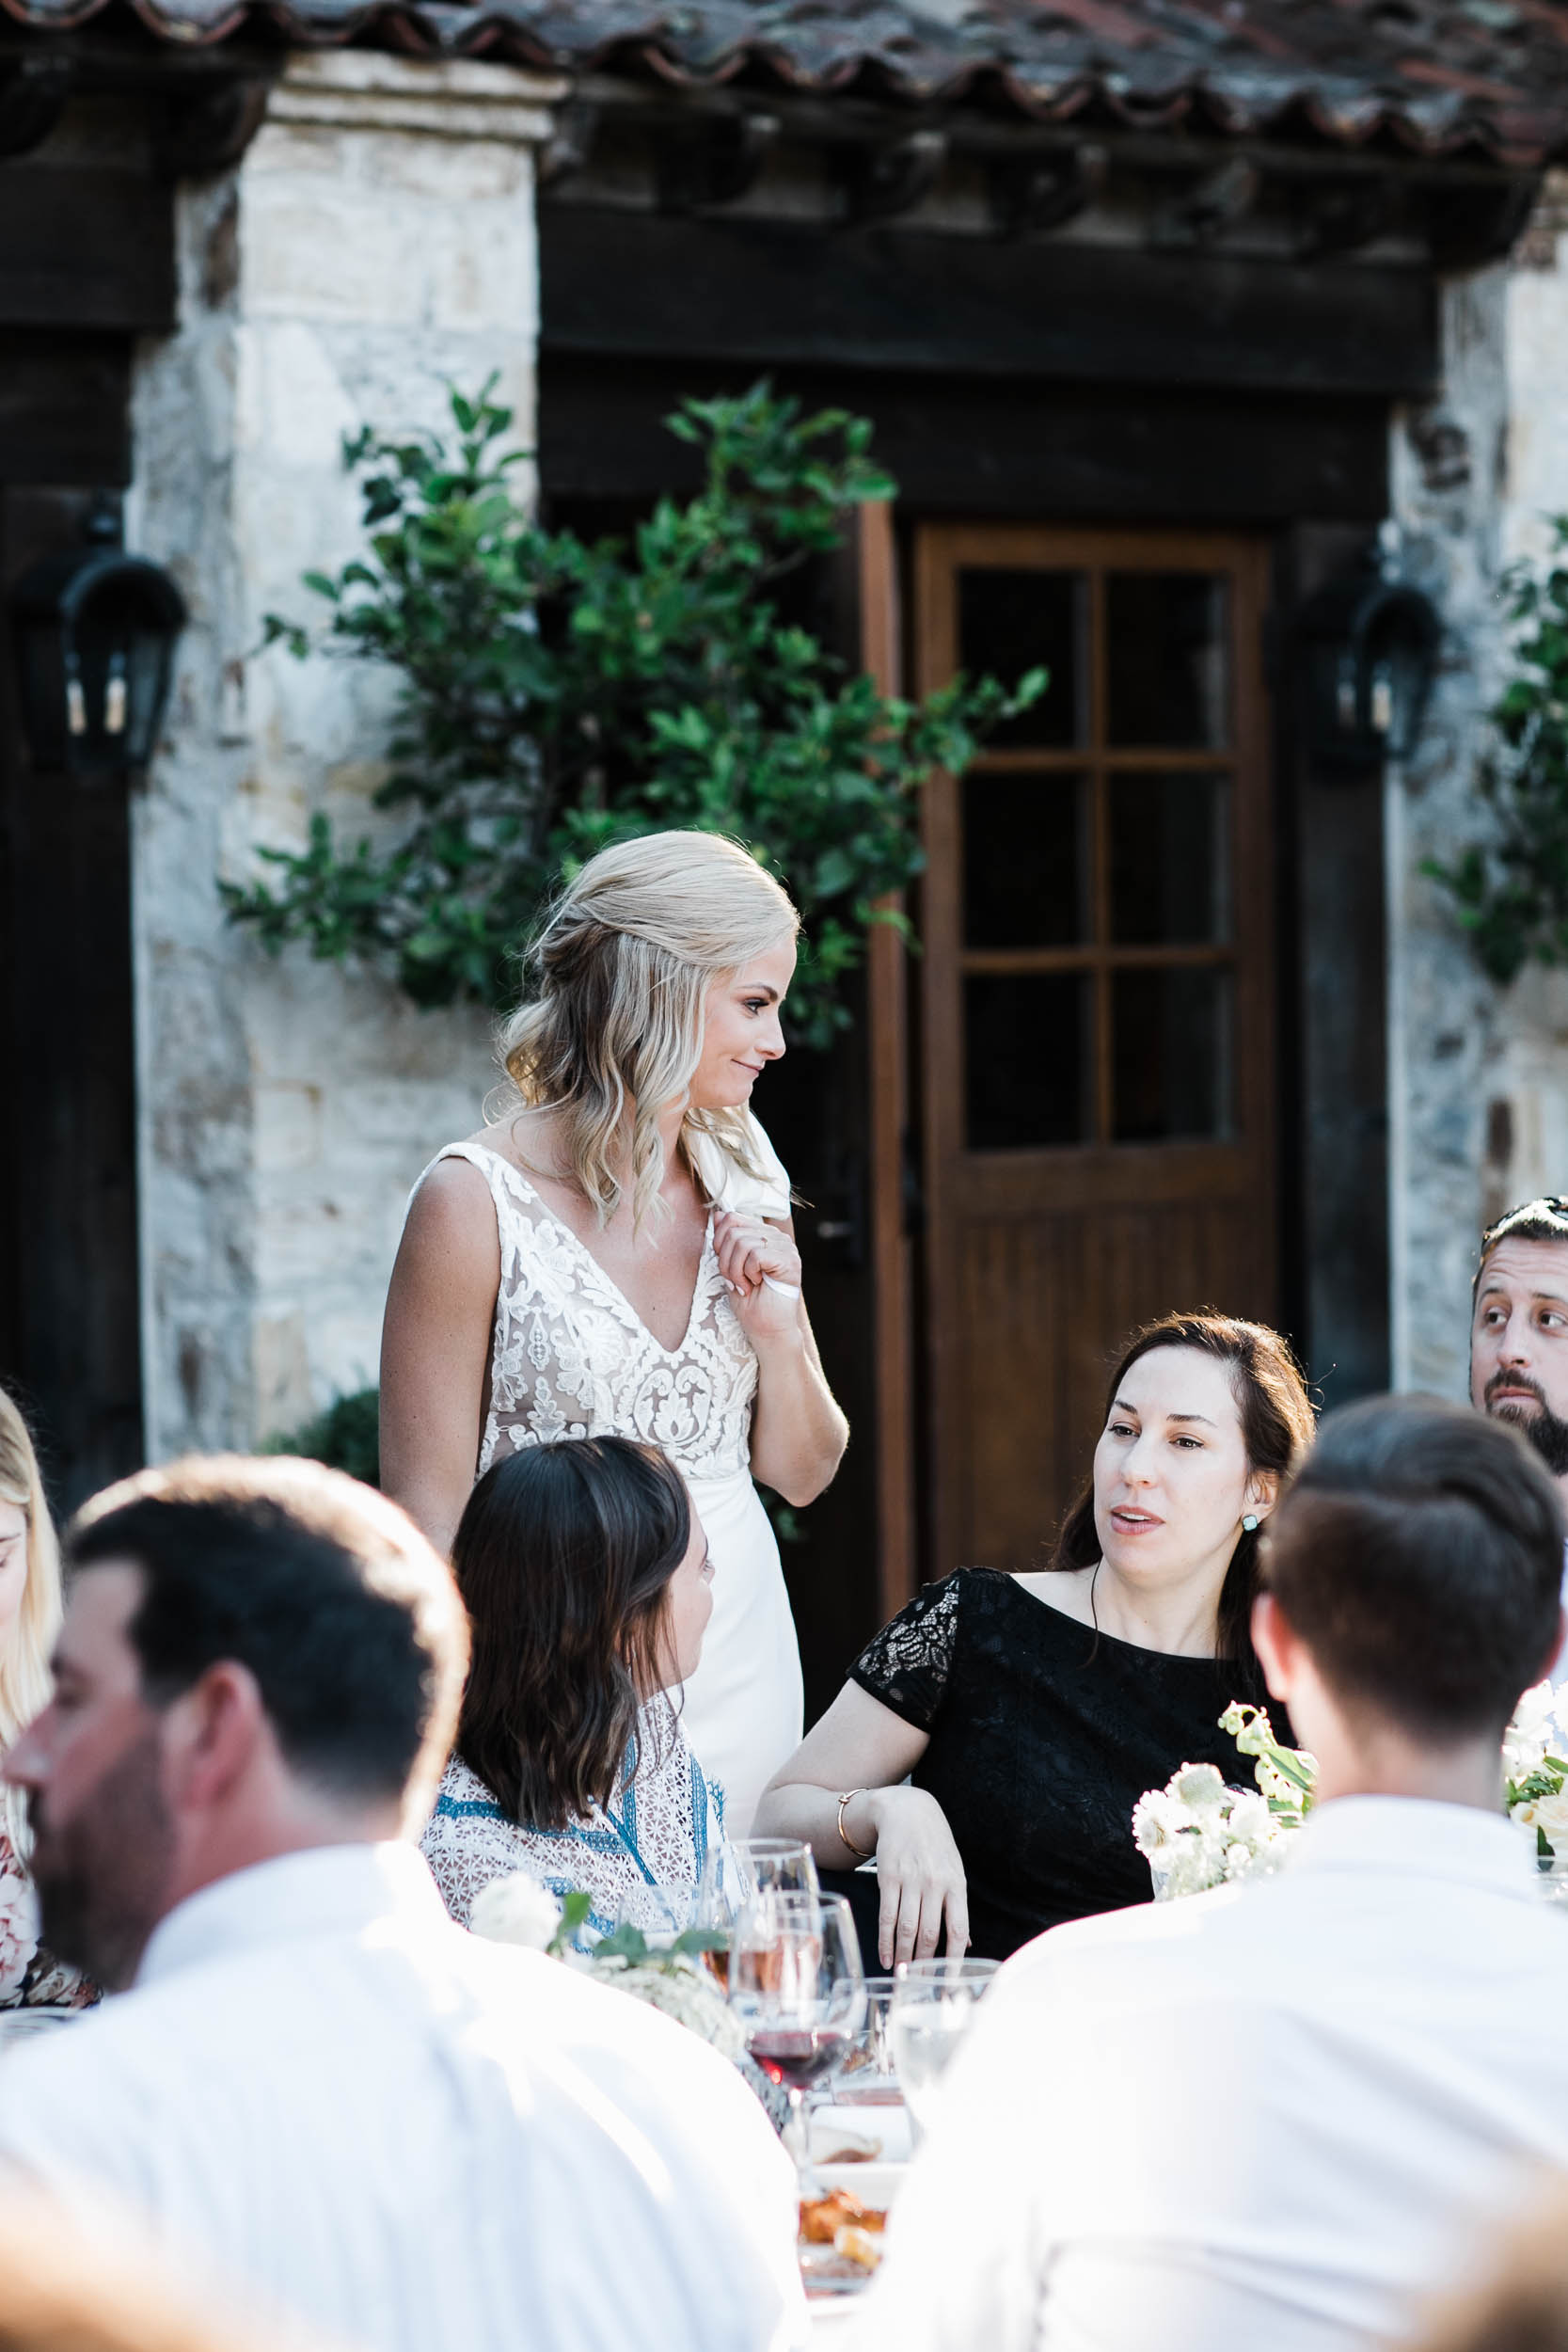 095_072118_D+K_Holman Ranch Wedding_Buena Lane Photography_1152ER.jpg